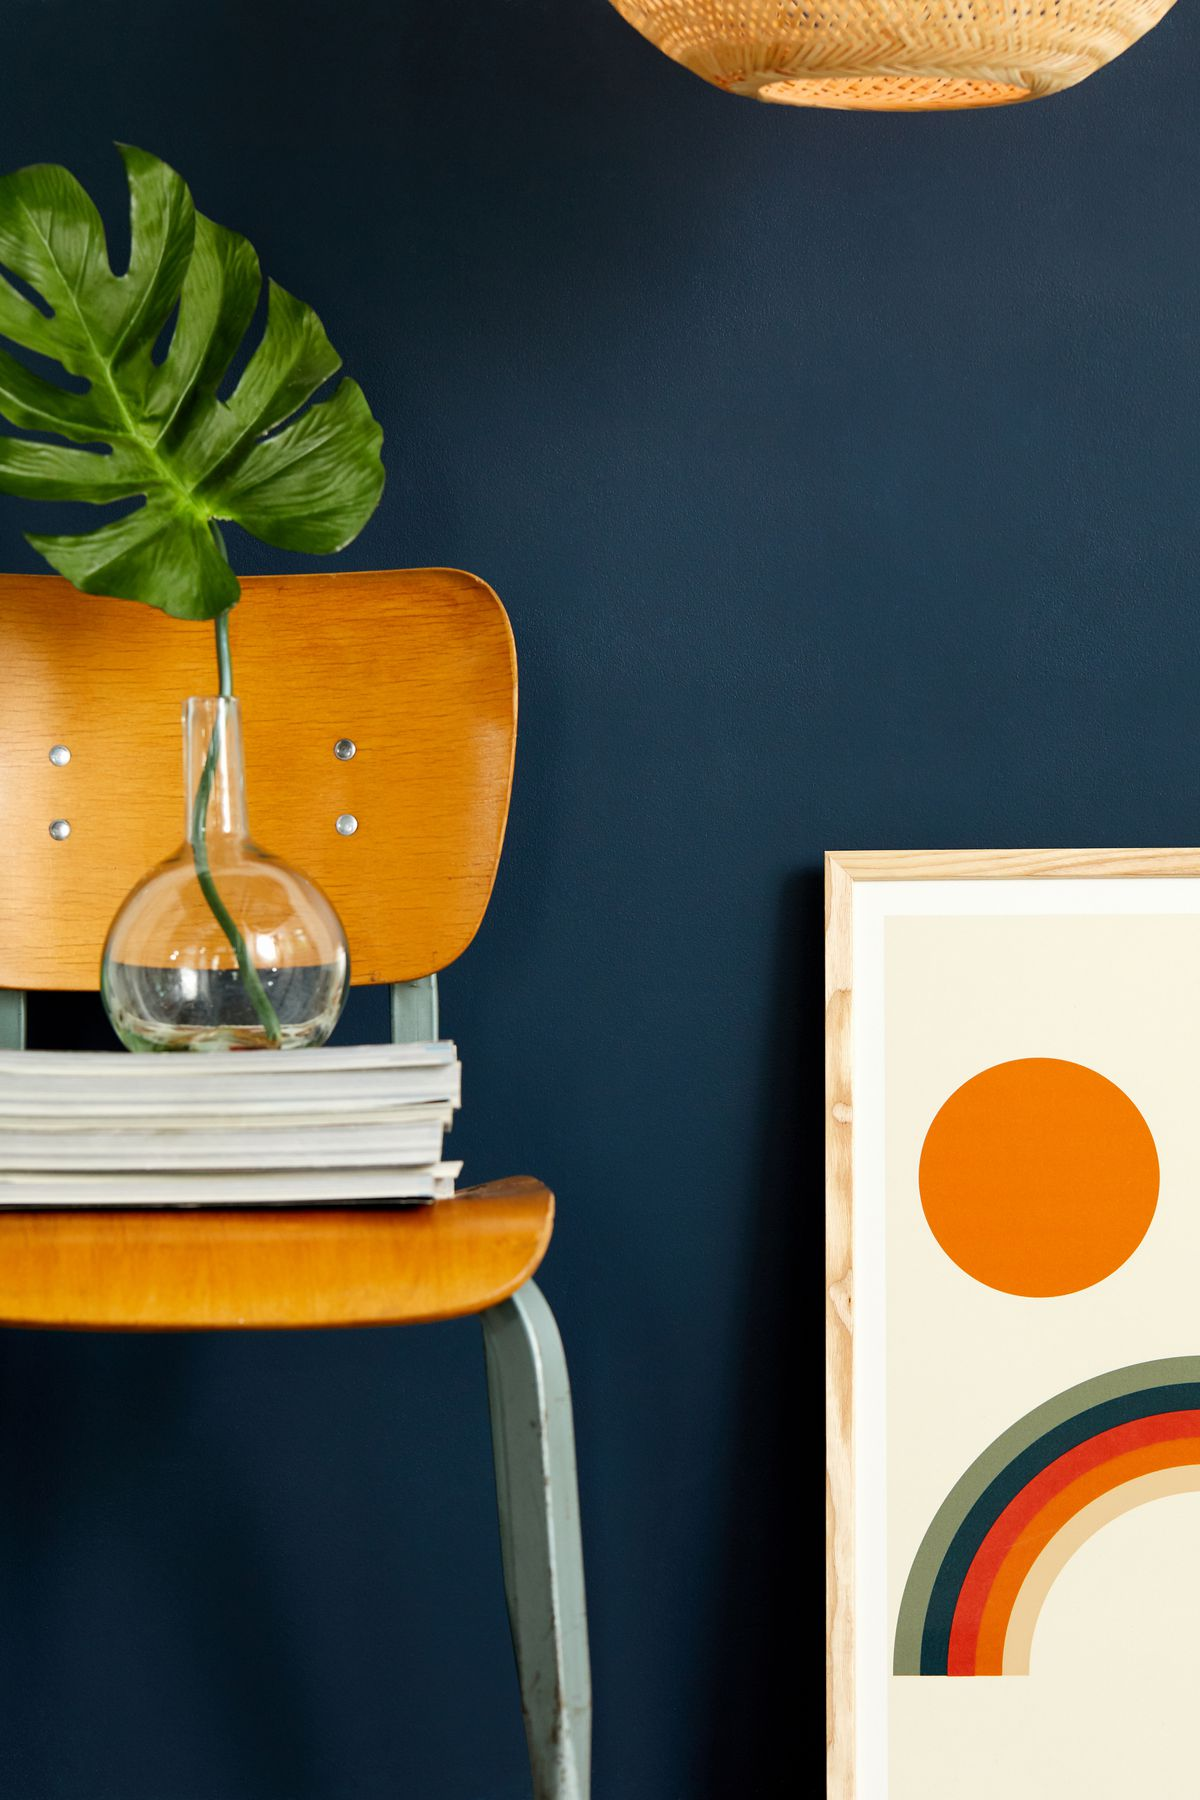 Chair next to deep blue wall